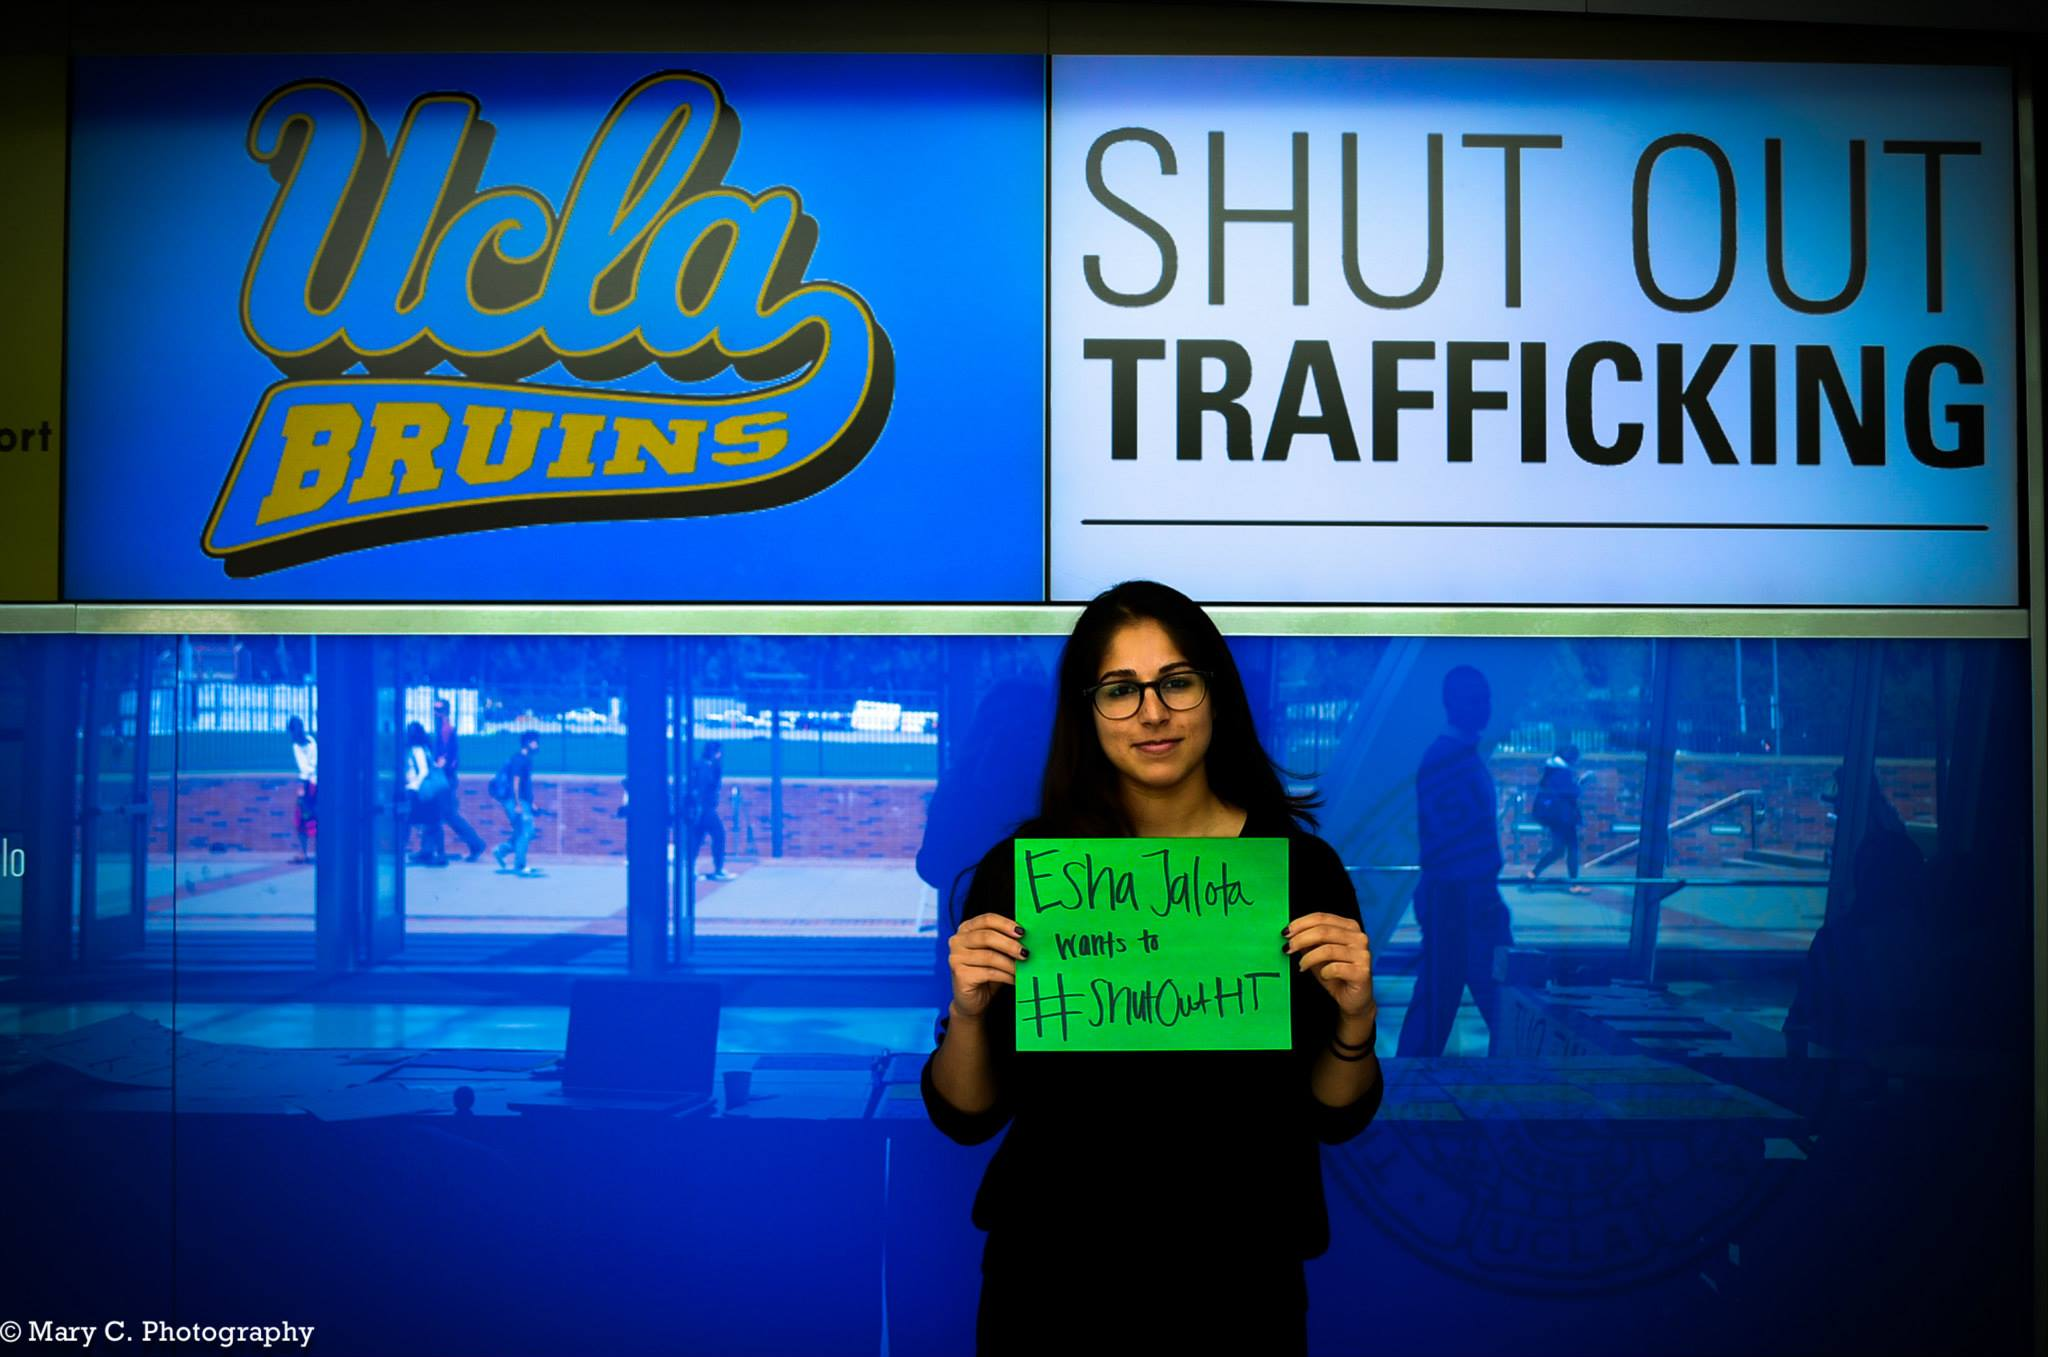 Esha Jalota standing up to Shut Out Trafficking #ShutOutHT. Photo Credit: Mary C.